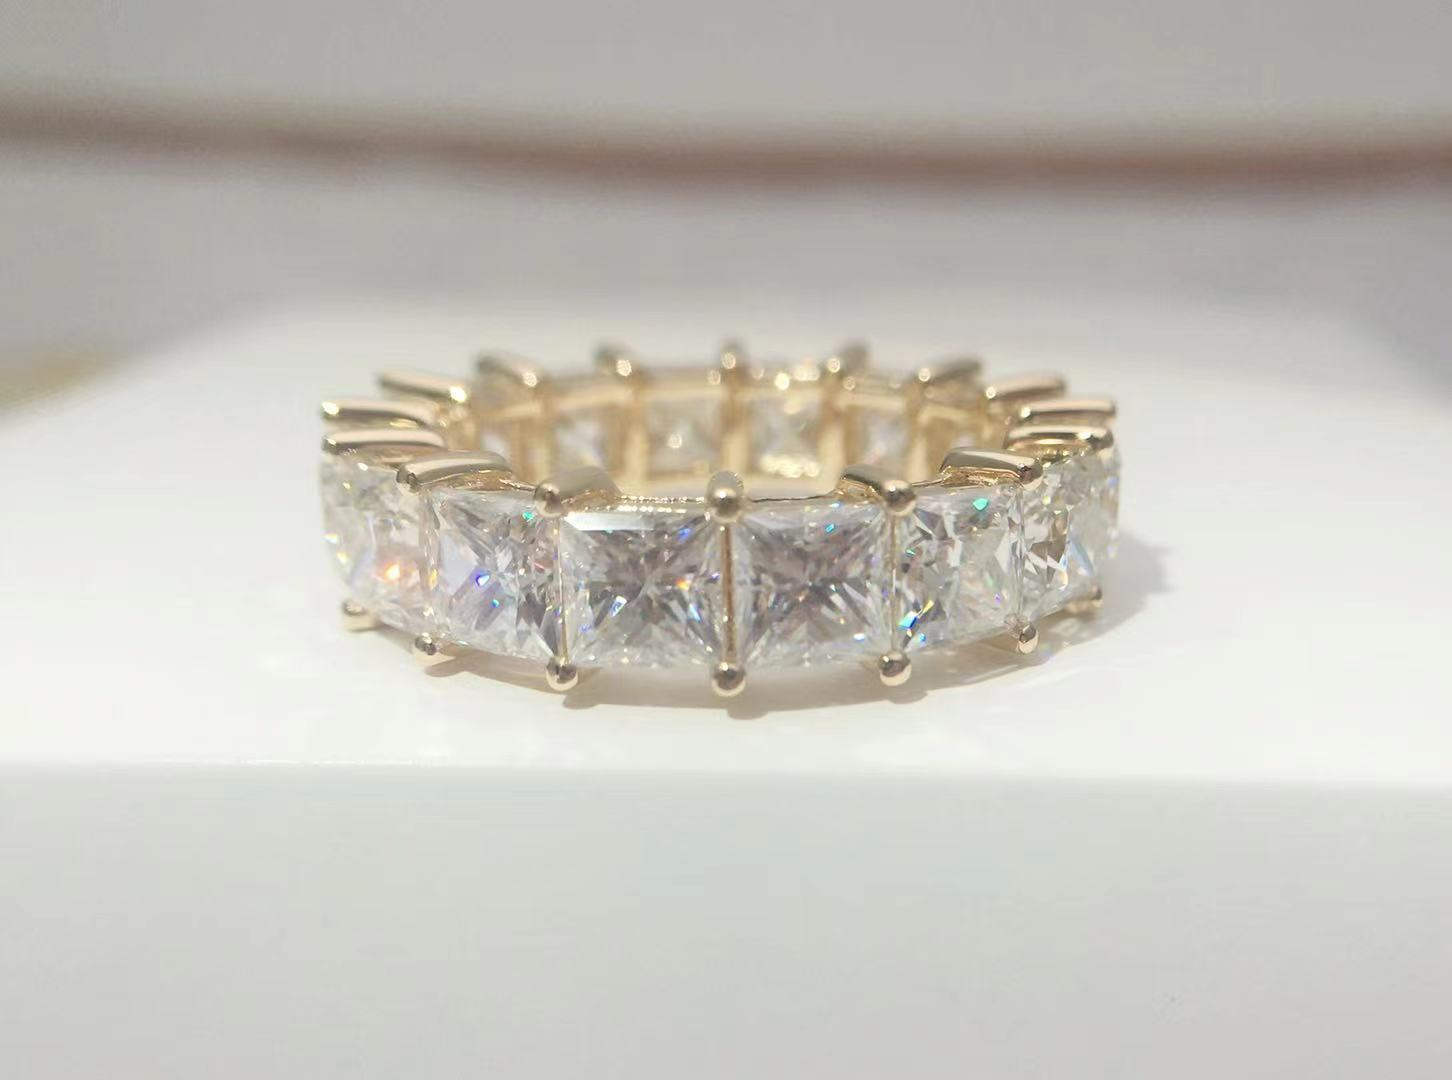 VVS D 18K الذهب Au750 الأميرة ساحة 8 قيراط مويسانيتي الفاخرة خاتم الماس الكامل الشريط